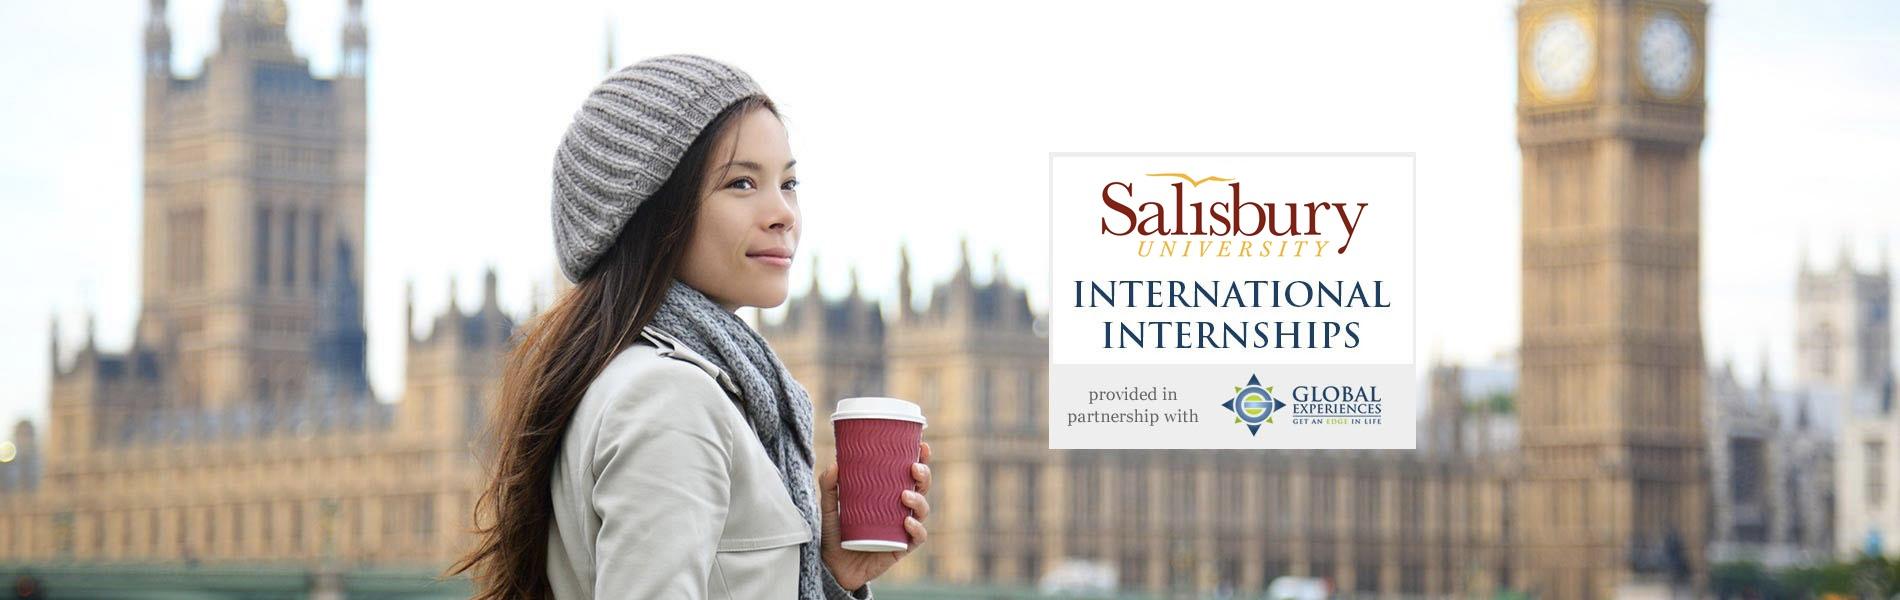 salisbury intern abroad